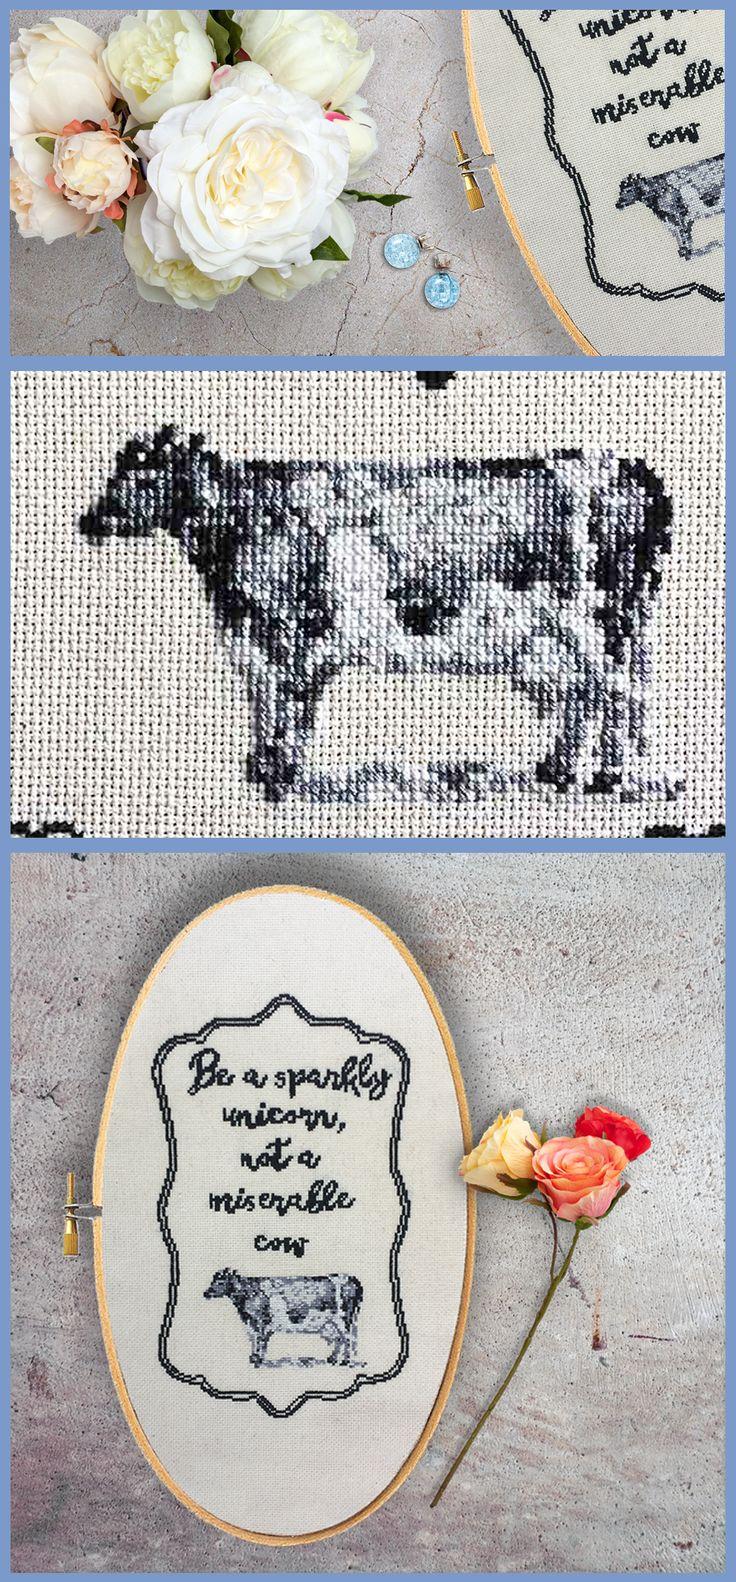 Customer favorite! Subversive modern cross stitch